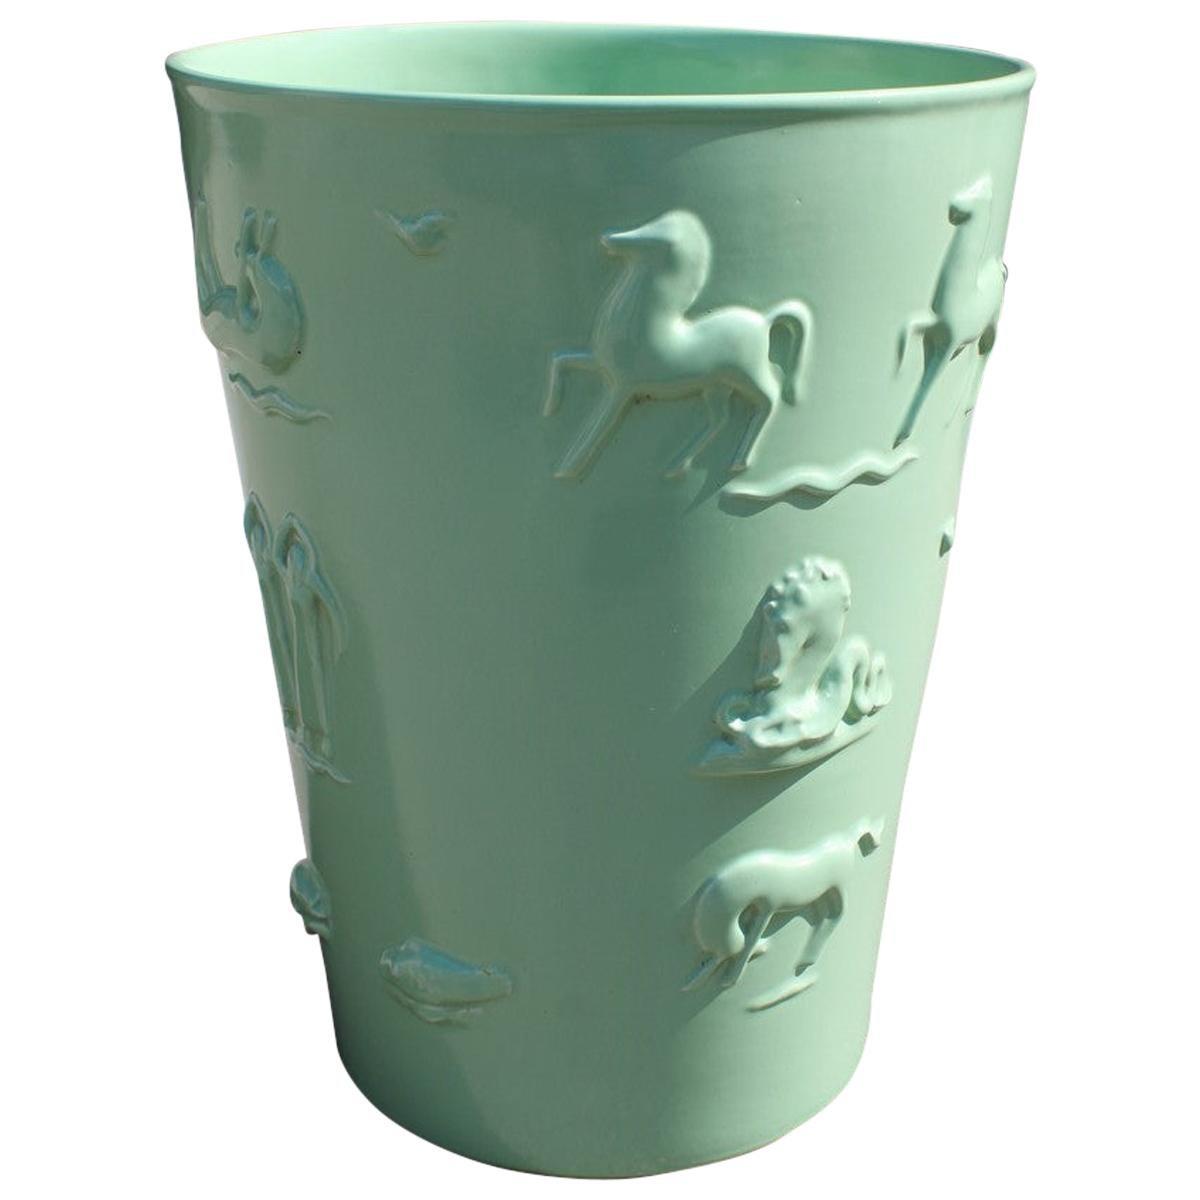 Rare Green Great Vase Angelo Biancini 1930 Futuristic Made in Italy Laveno